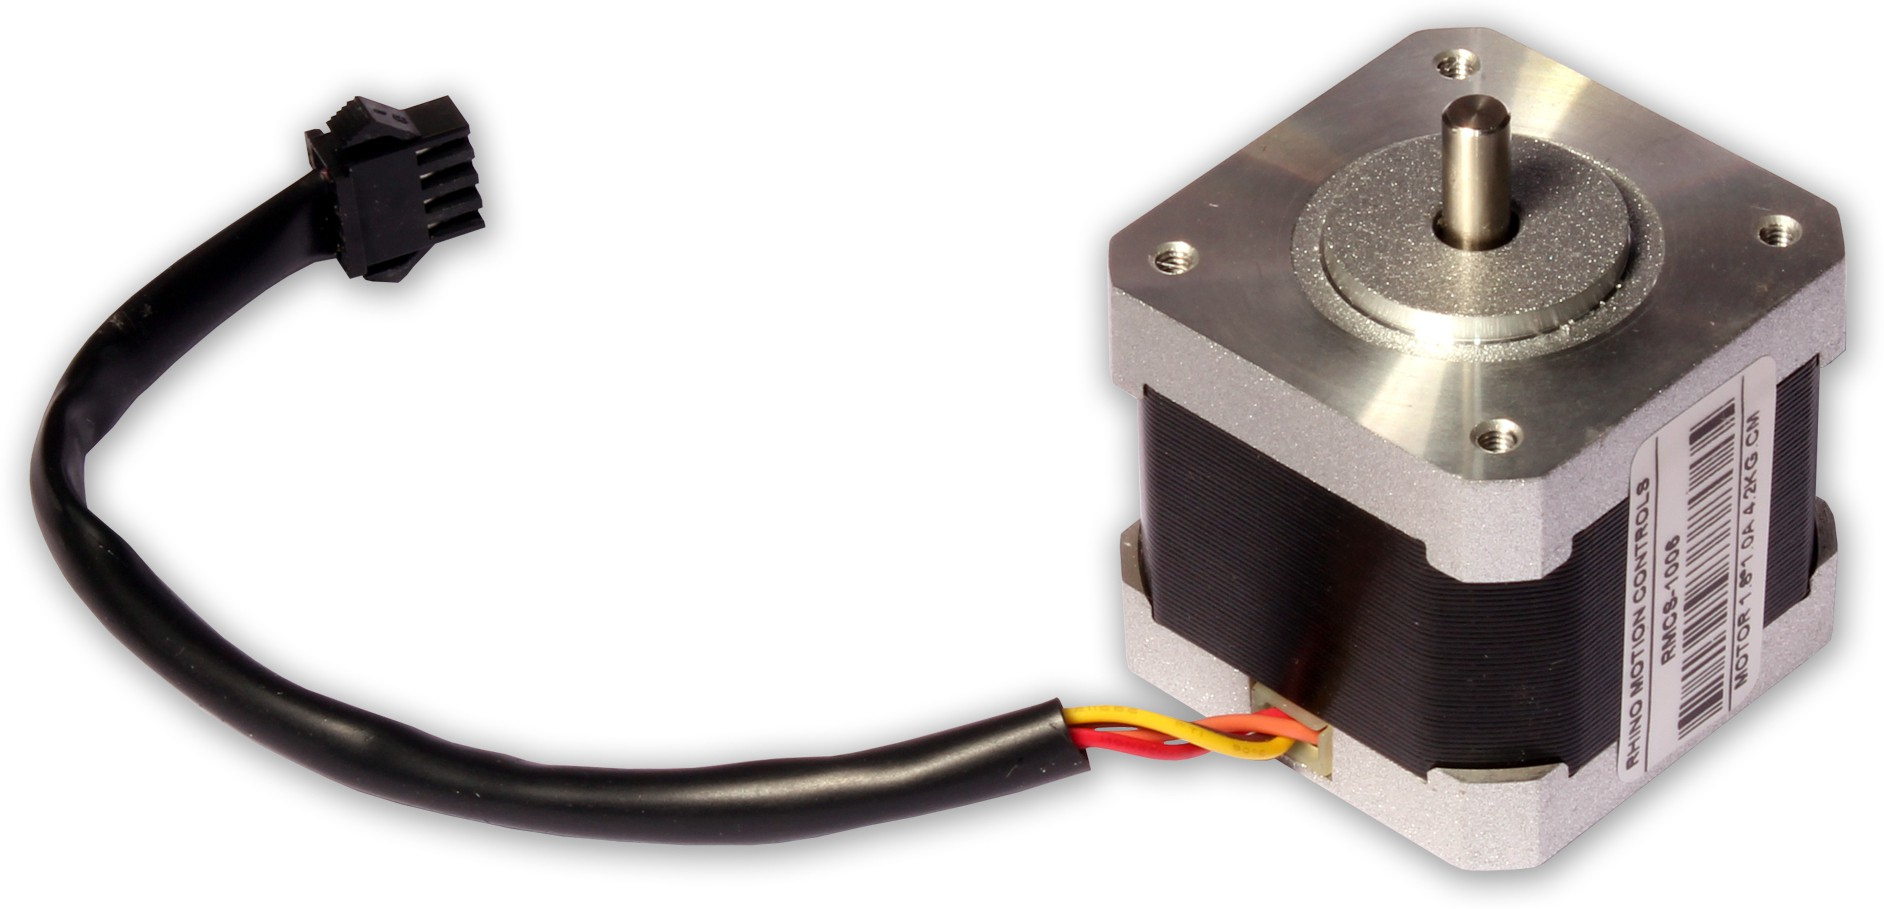 Robokits nema17 stepper motor torque price in for Stepper motor buy online